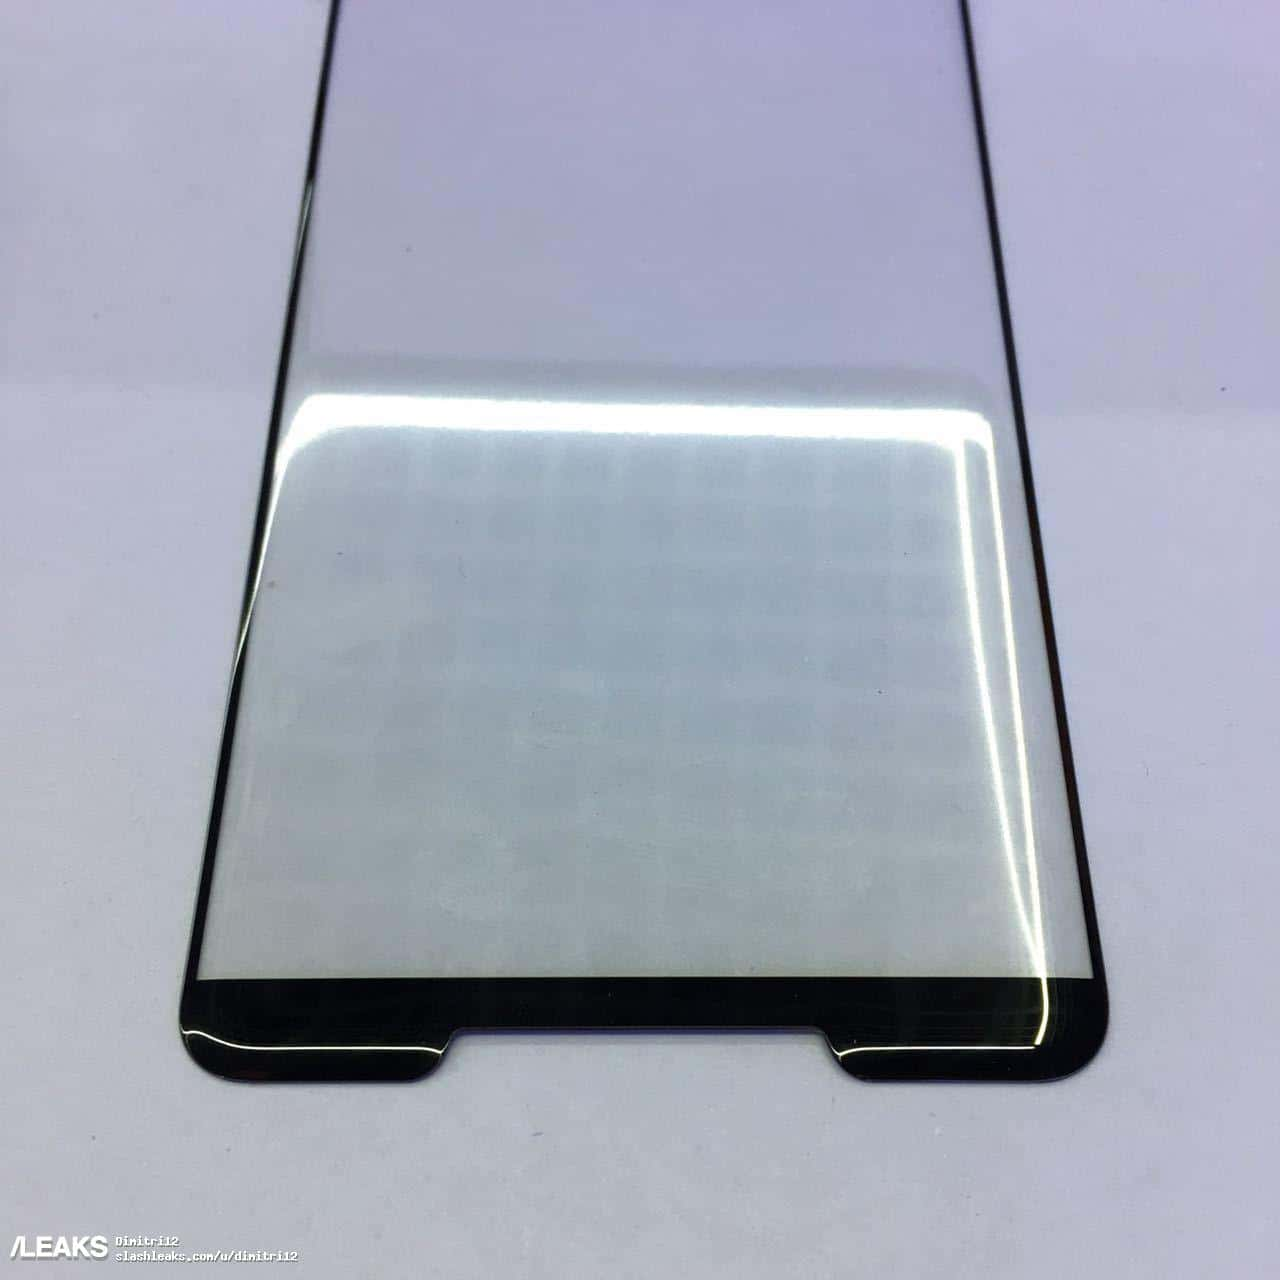 Pixel 2 XL Screen Protector SlashLeaks 3